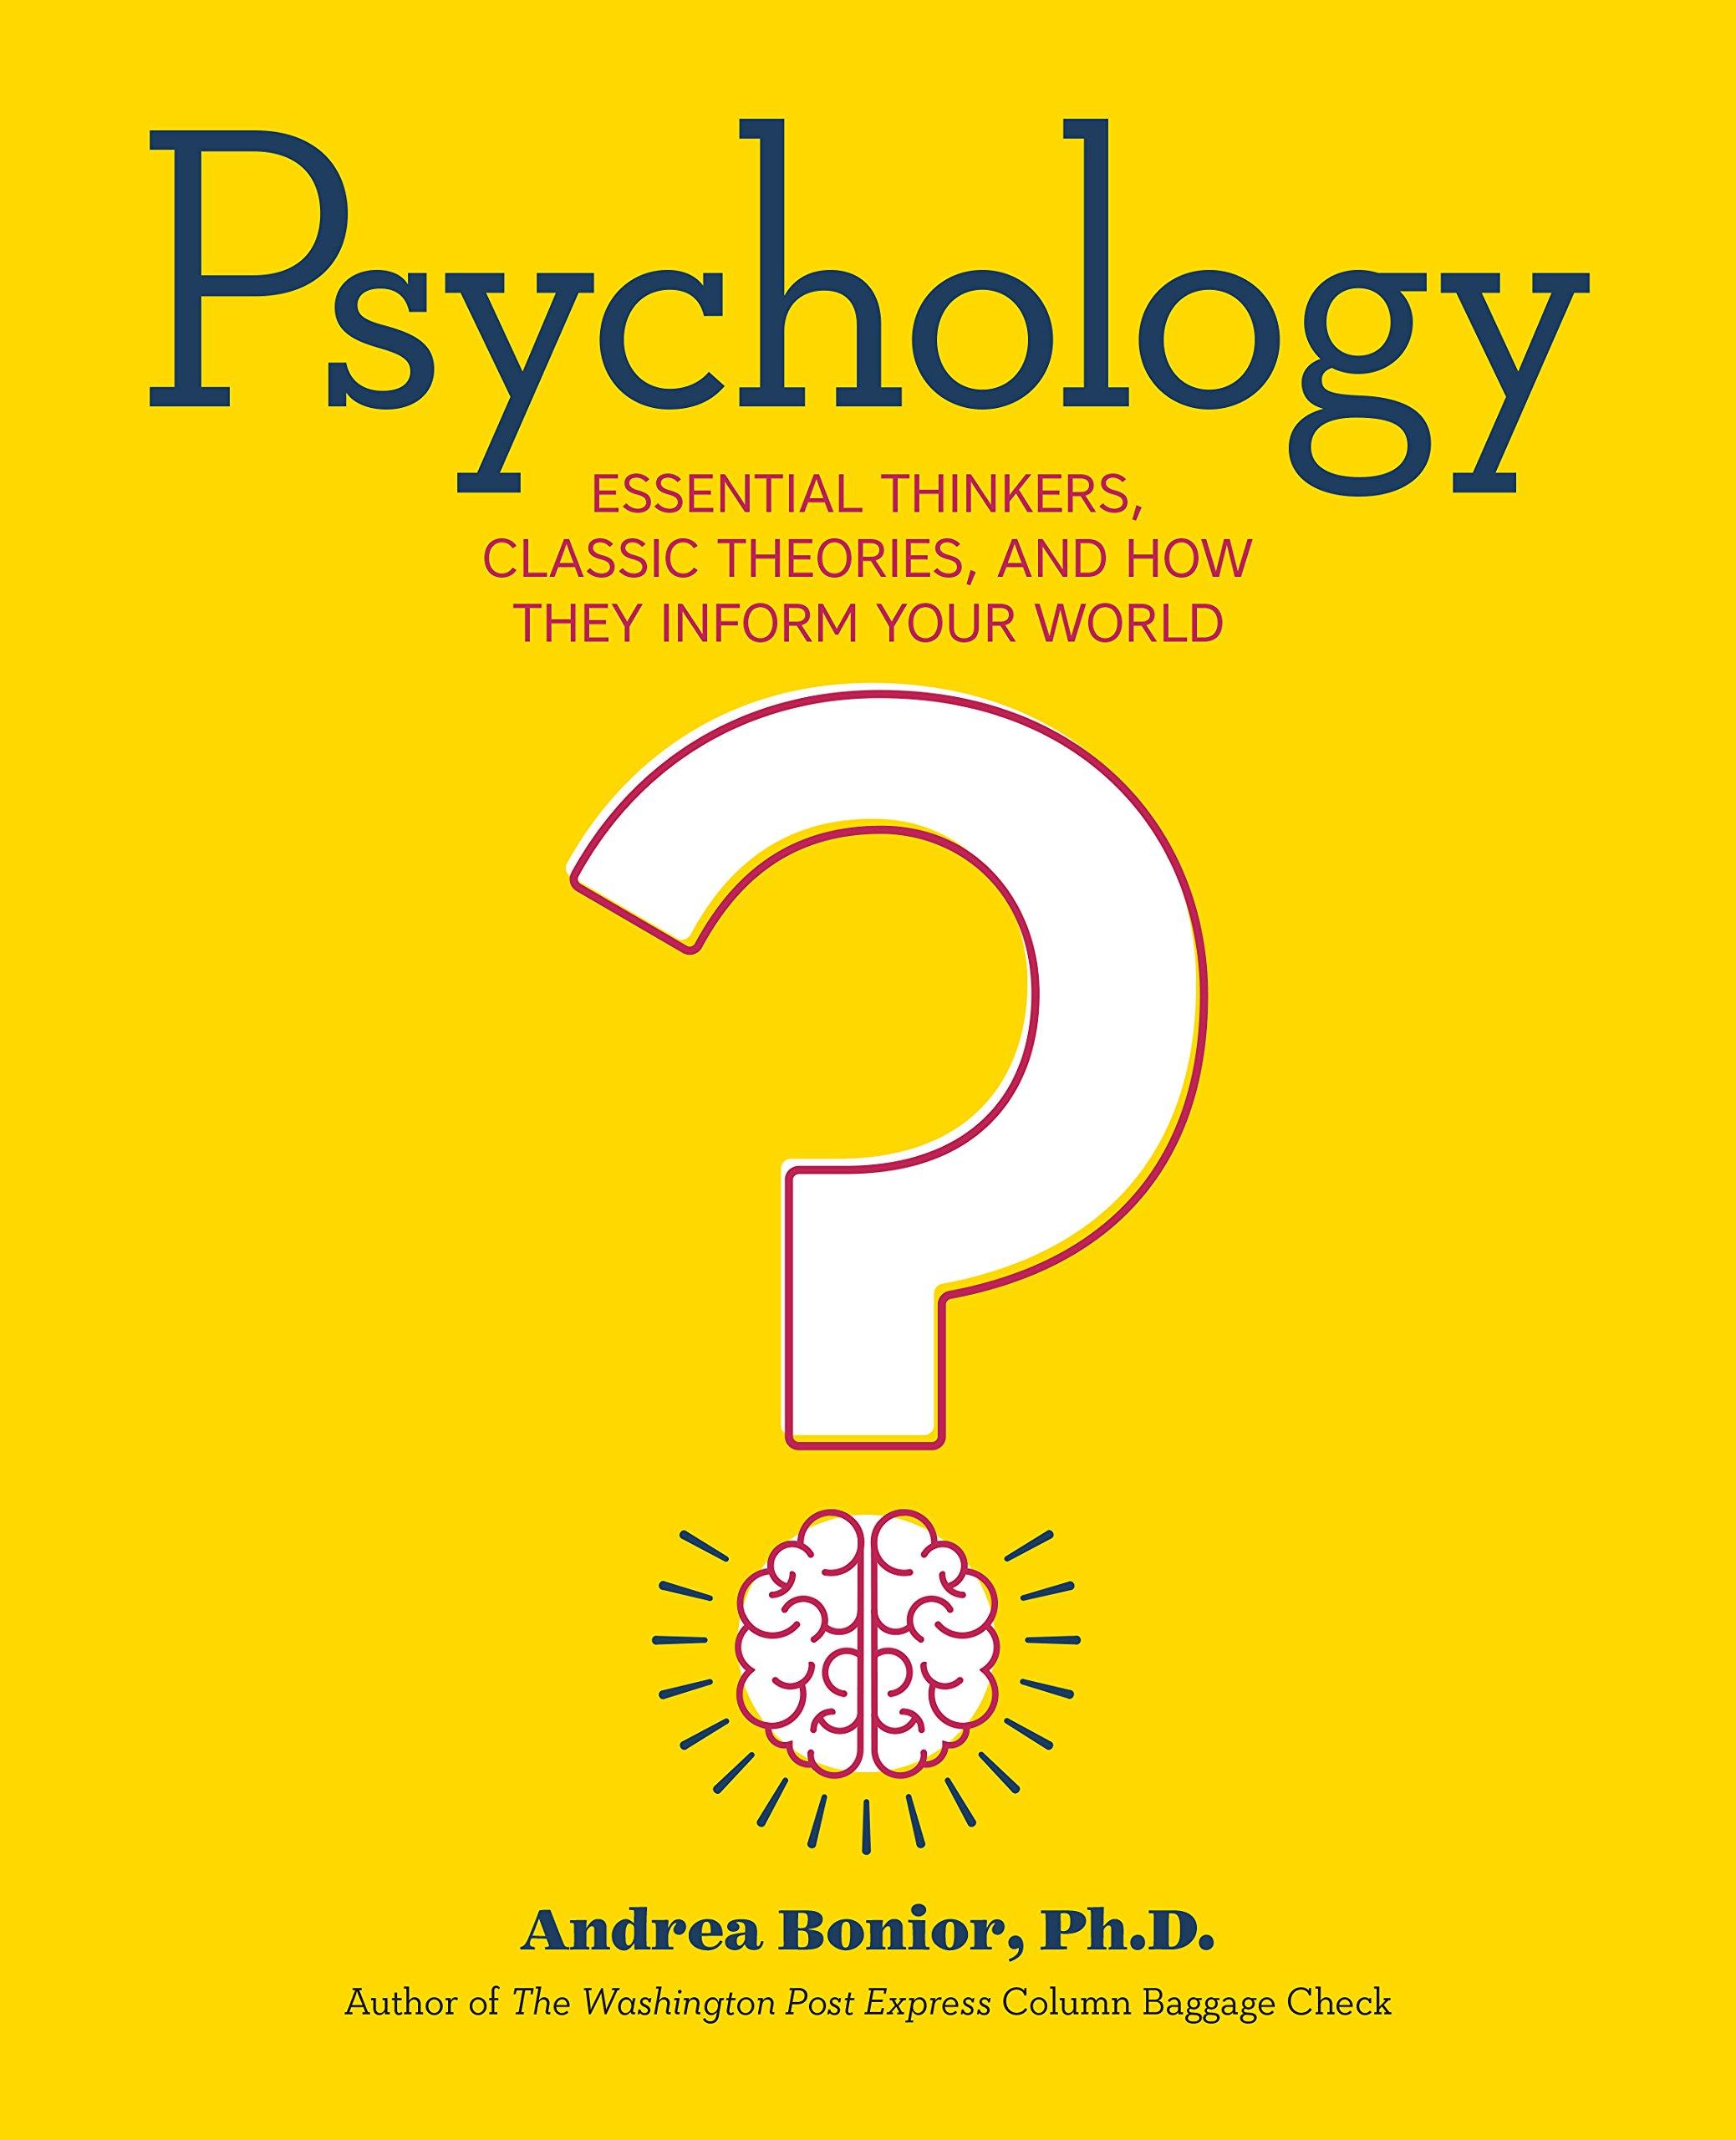 psychology-press.jpg